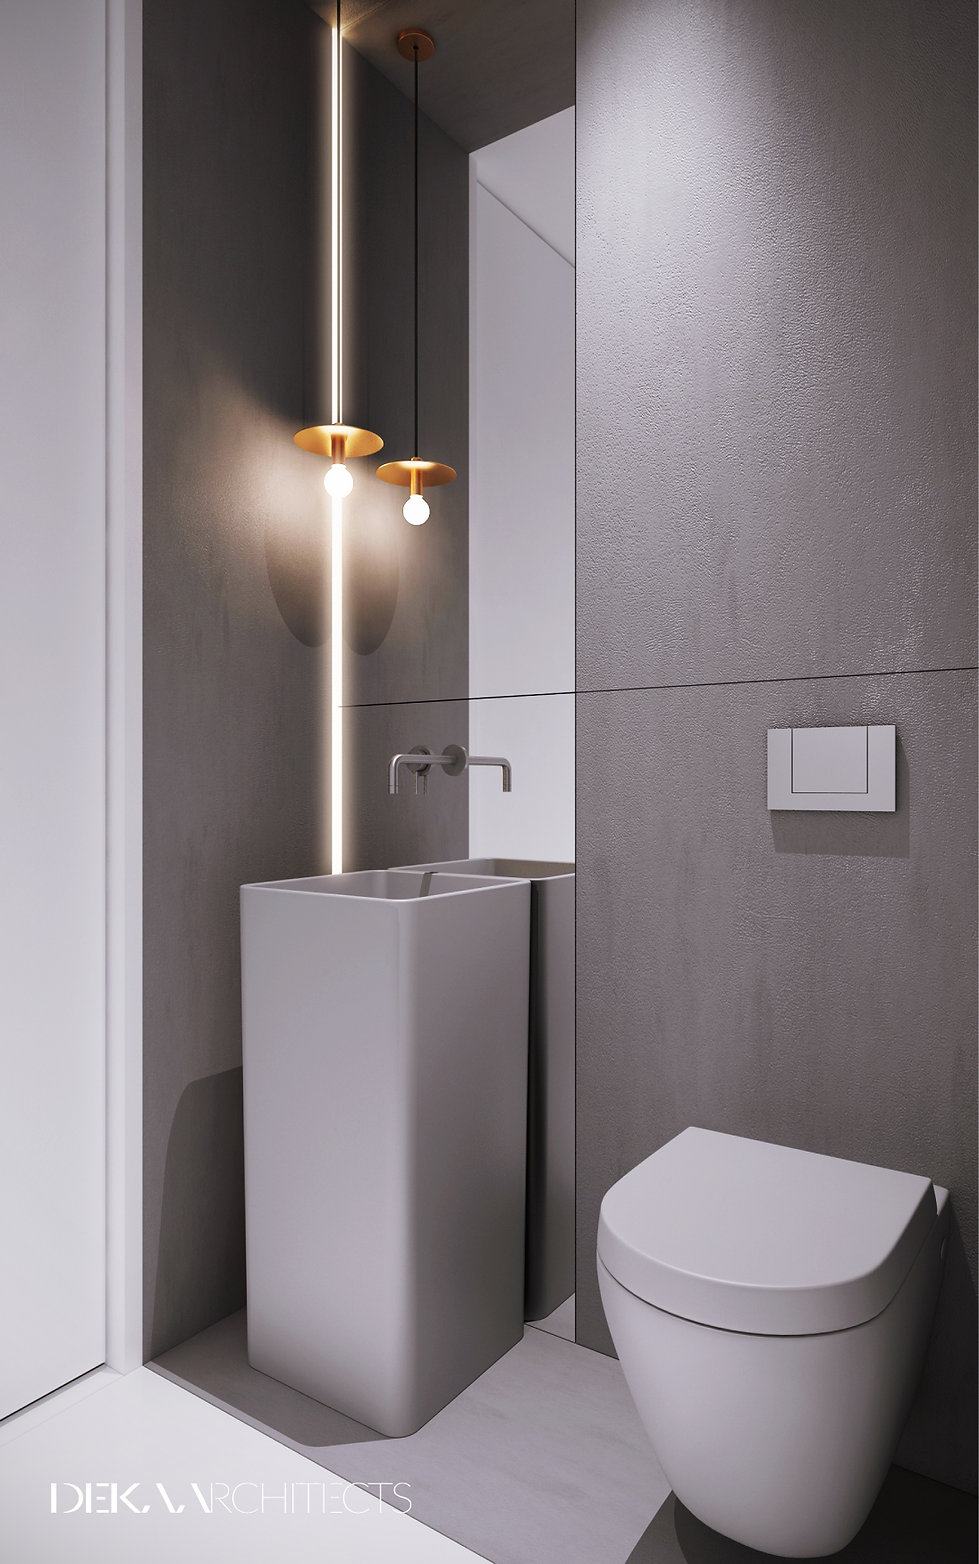 019-architekt-wnetrza-warszawa-projekt-d